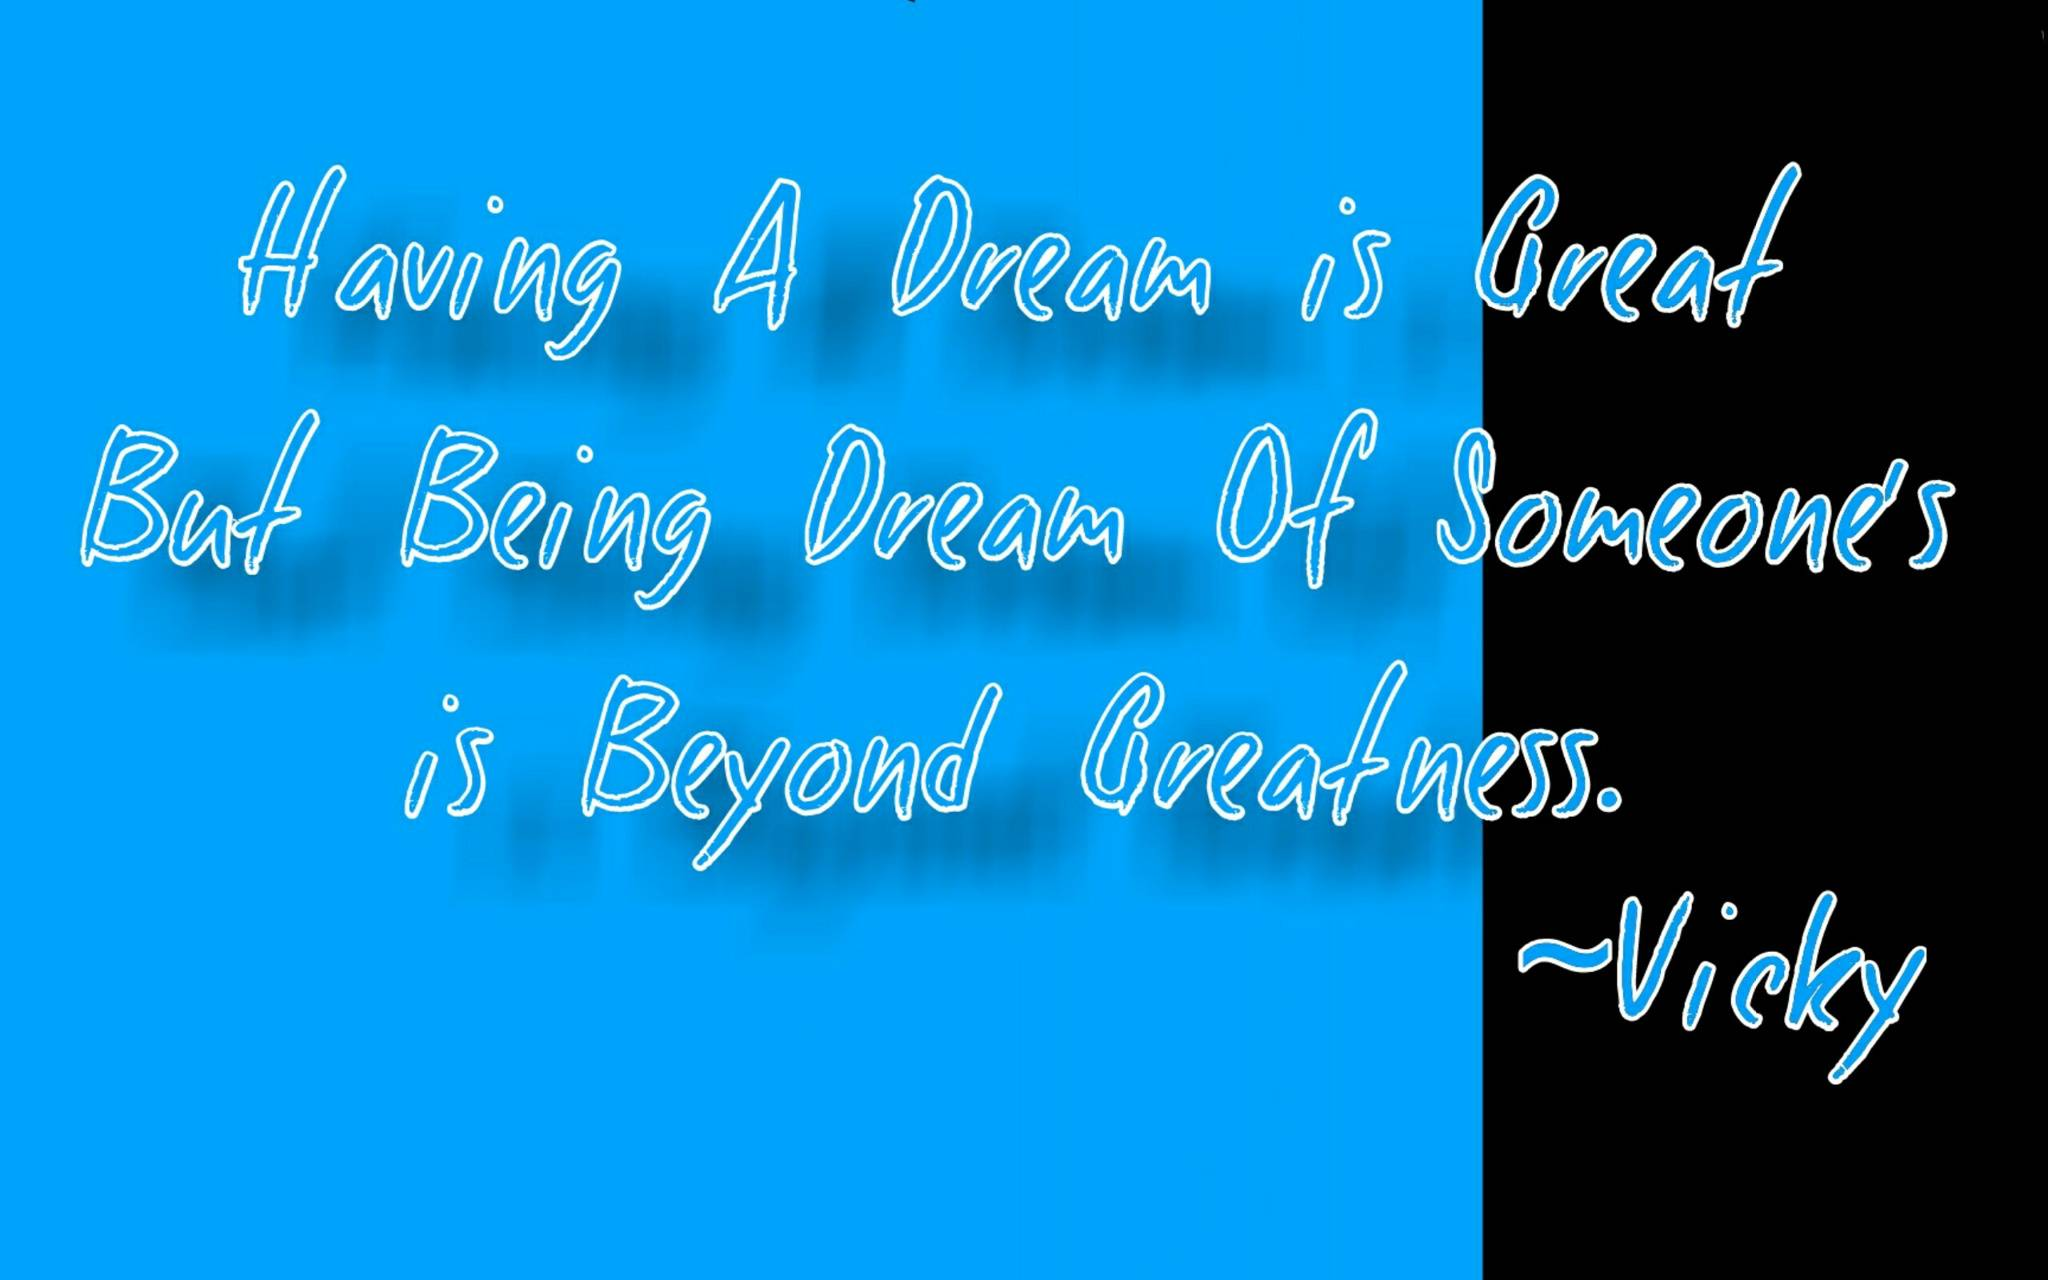 Having A dream